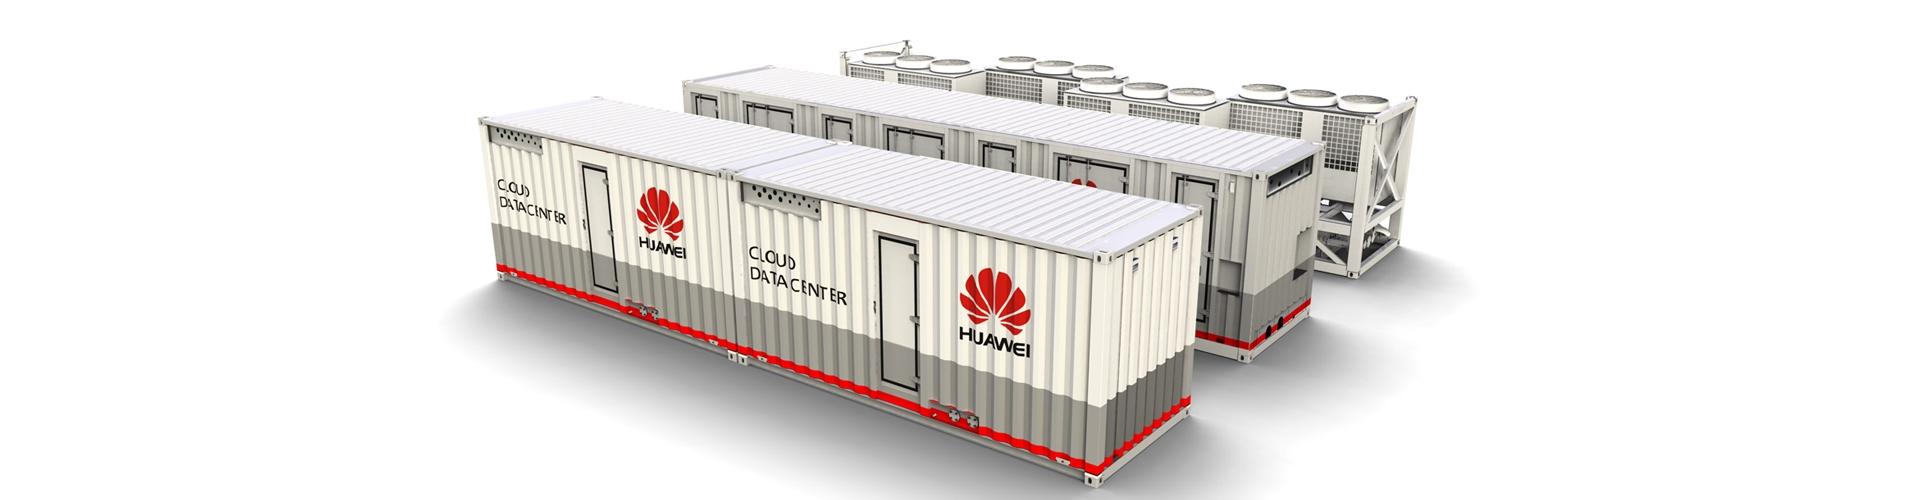 Centre de date in container